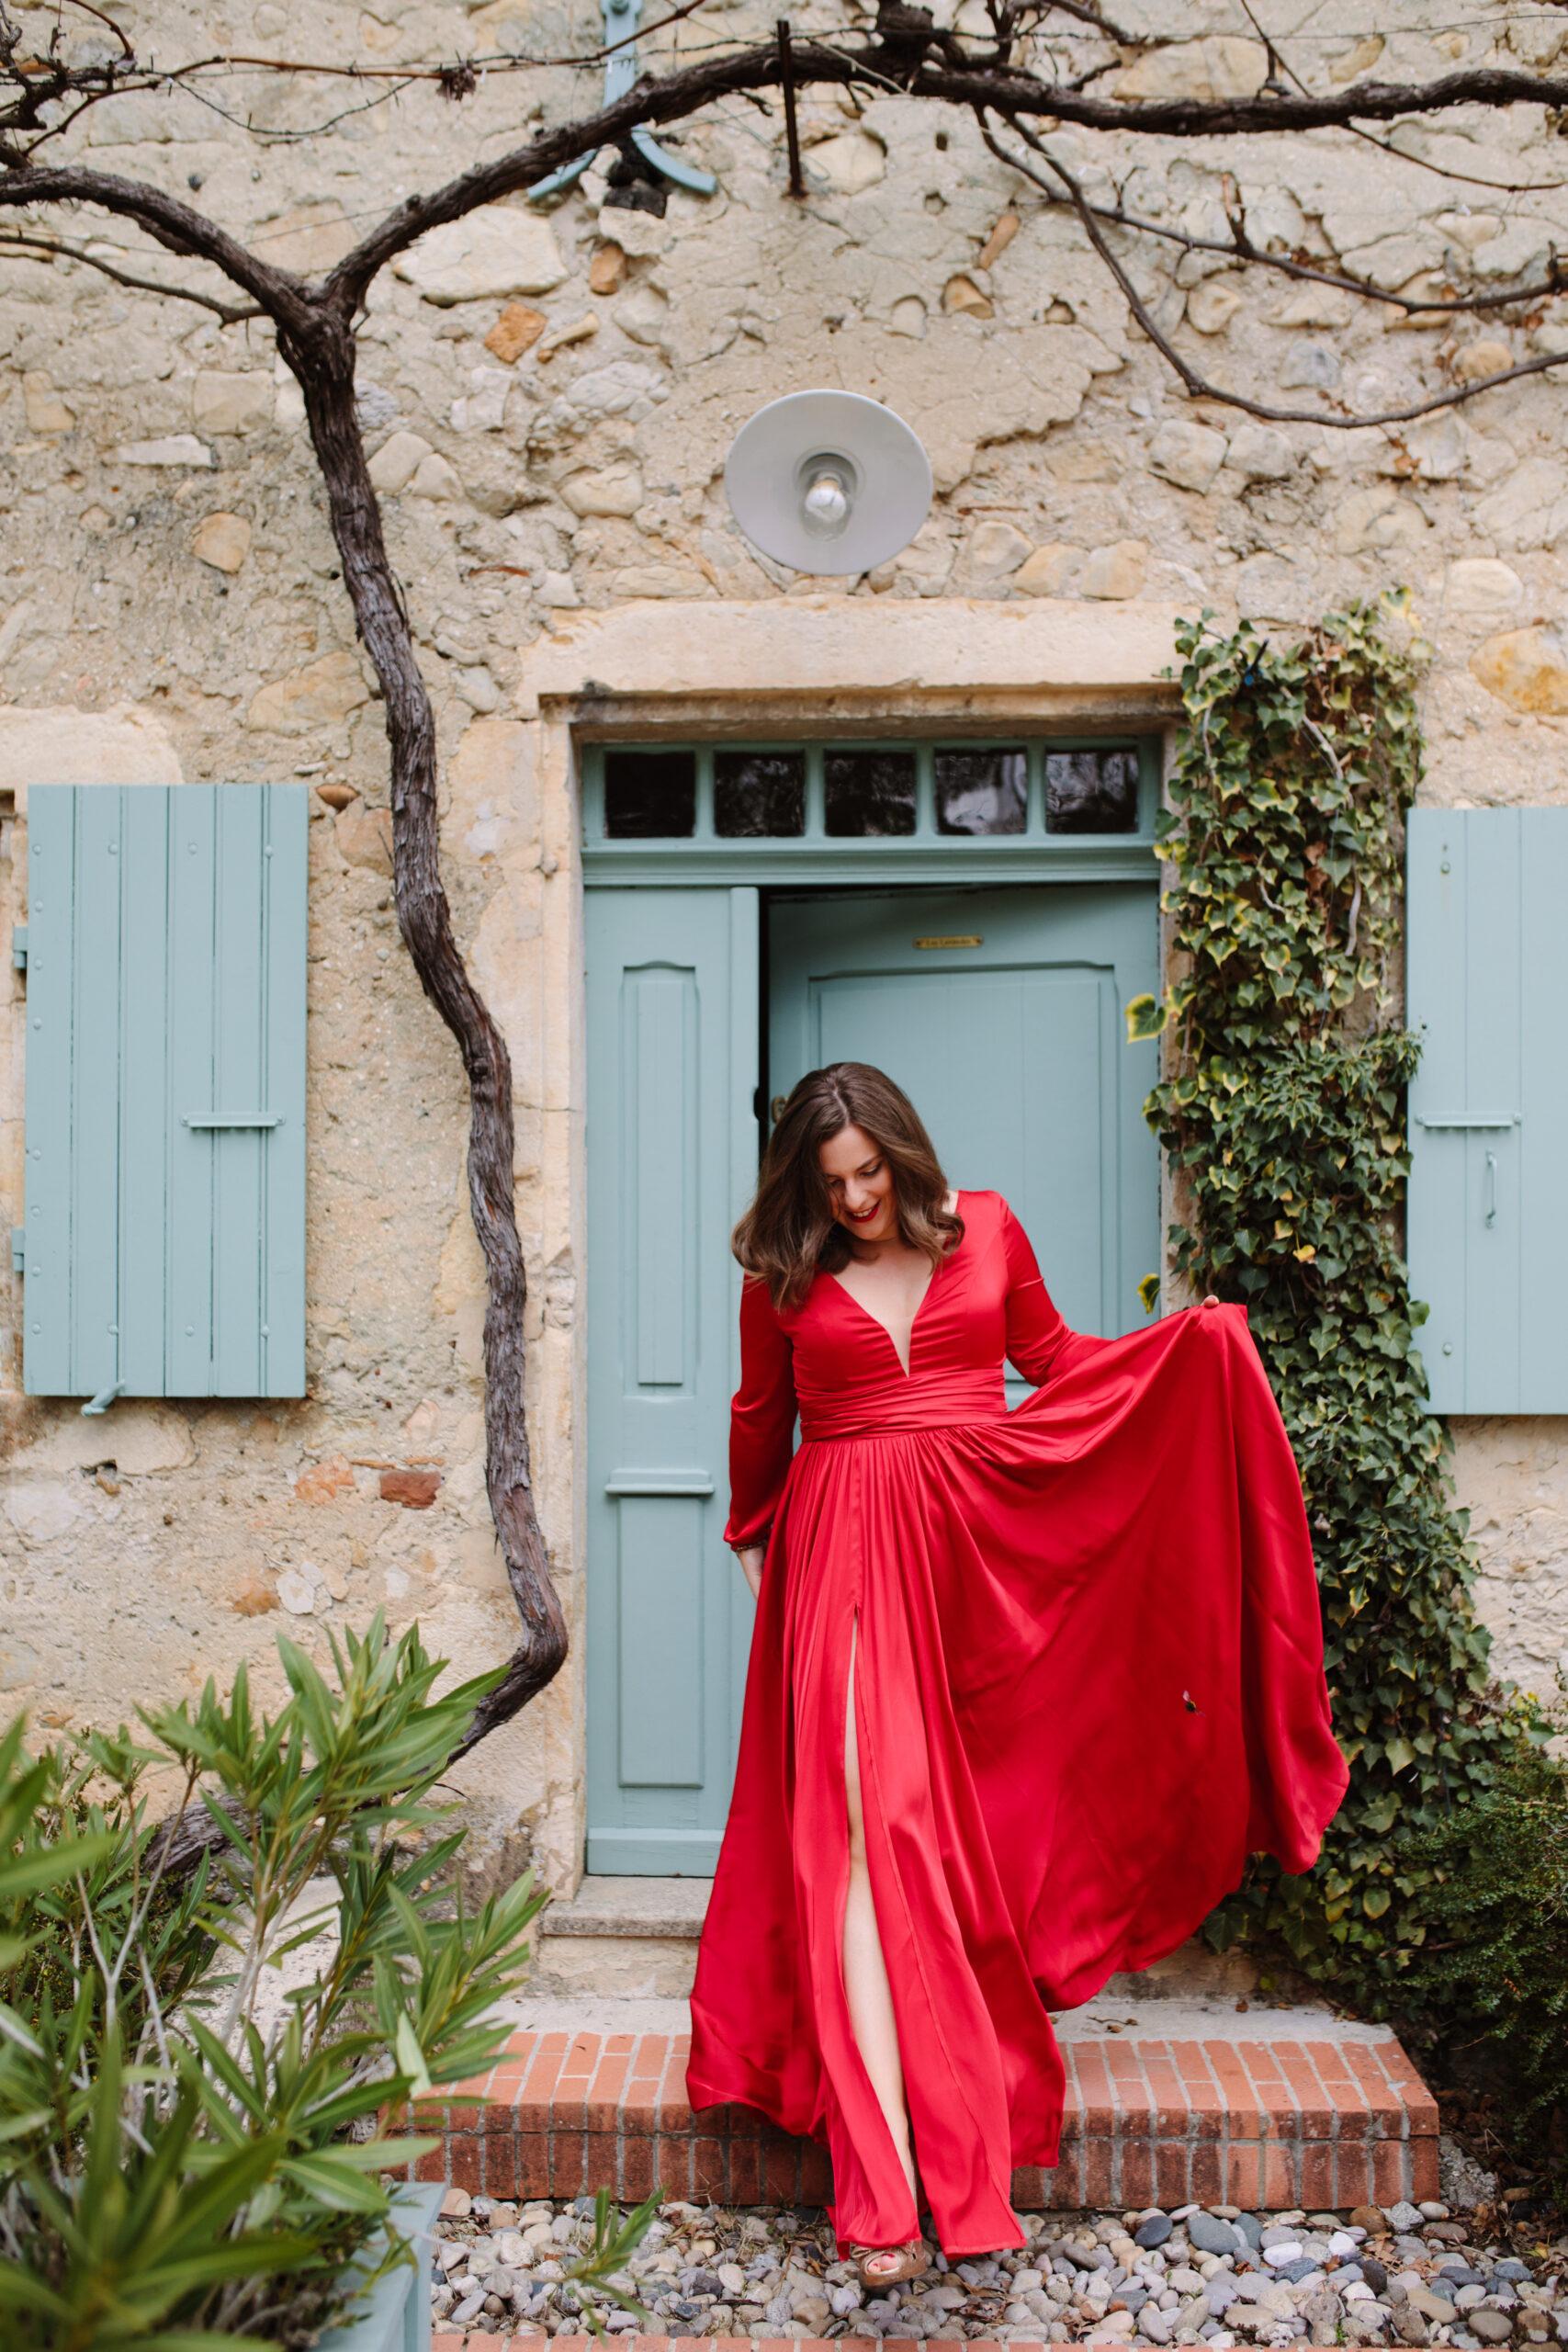 elodie bansard wedding planner dday organisation de mariage lyon france europe